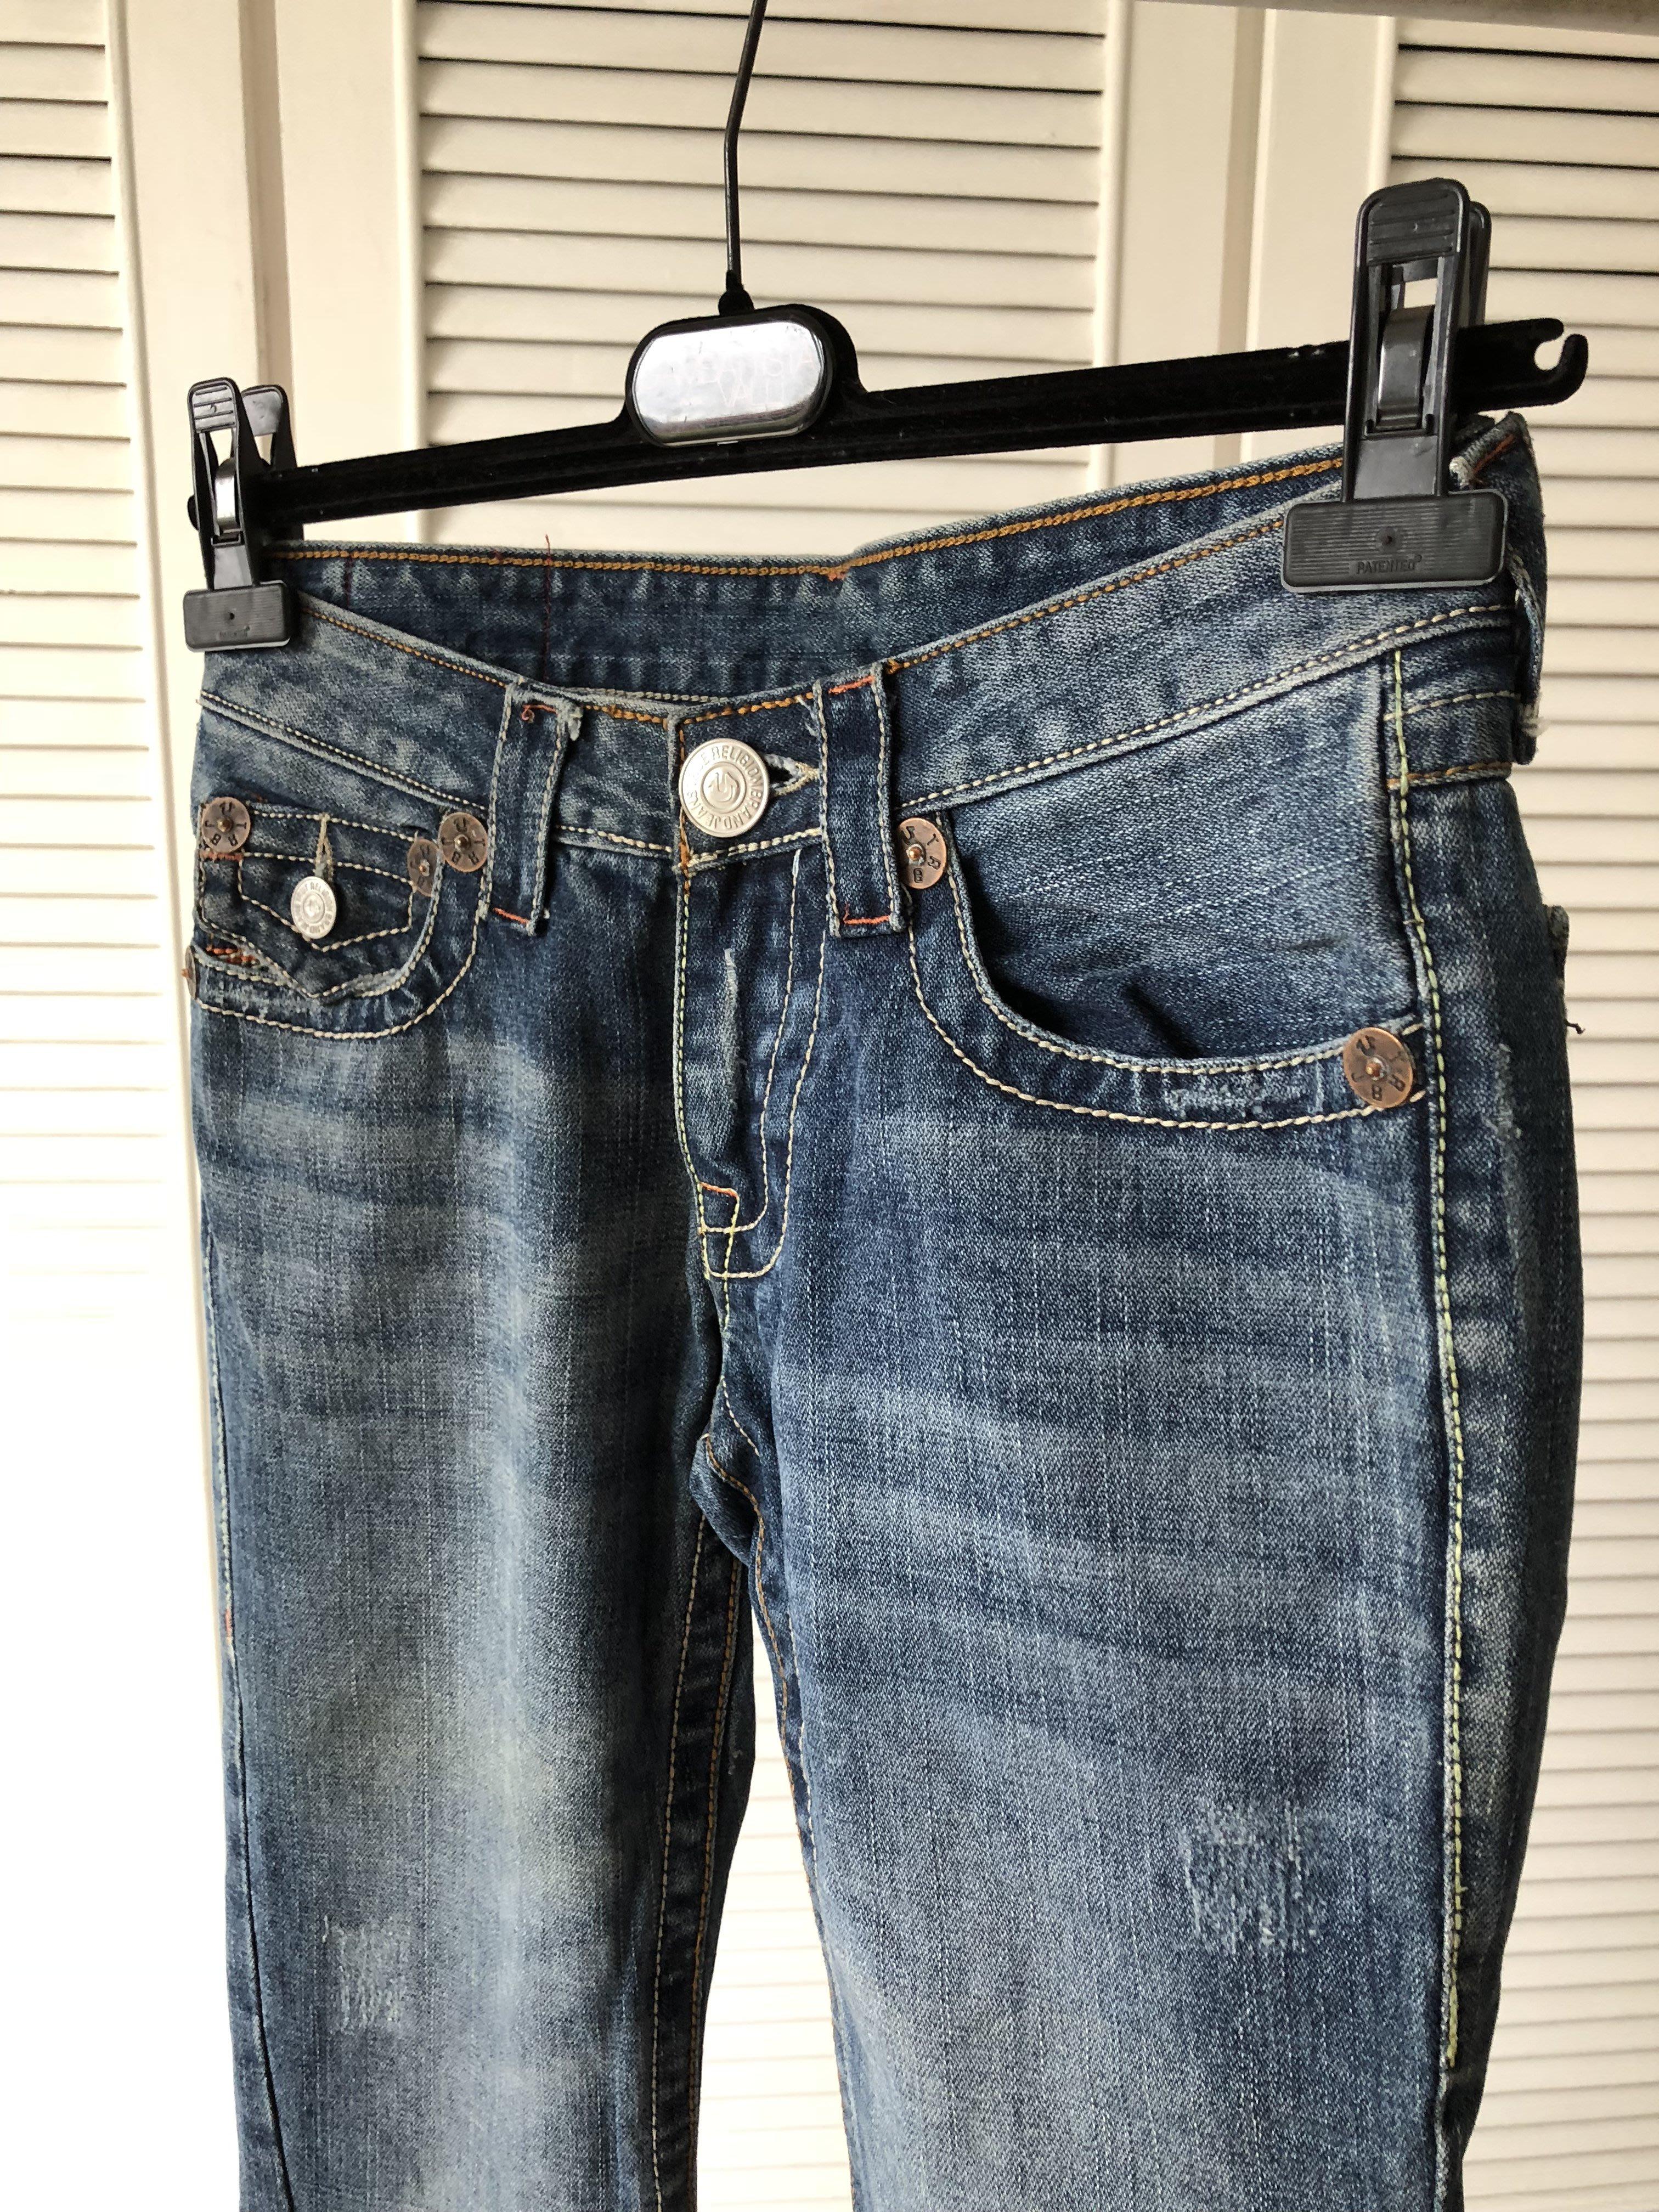 【TRUE RELIGION 】超美超正點立體刷色翹臀七彩縫線直筒牛仔褲JOEY 26